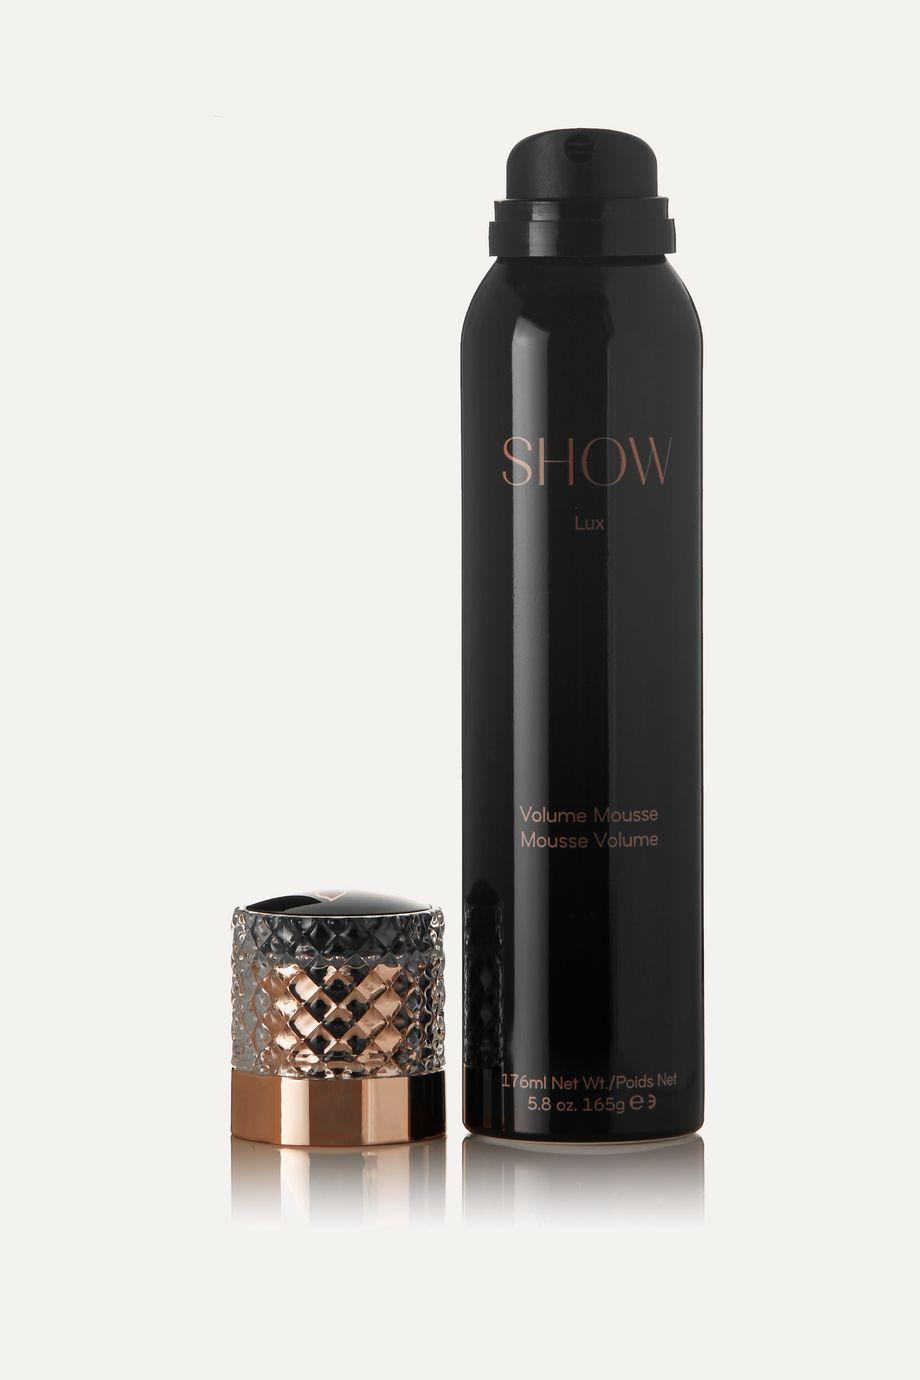 SHOW Beauty Lux Volume Mousse, 176ml